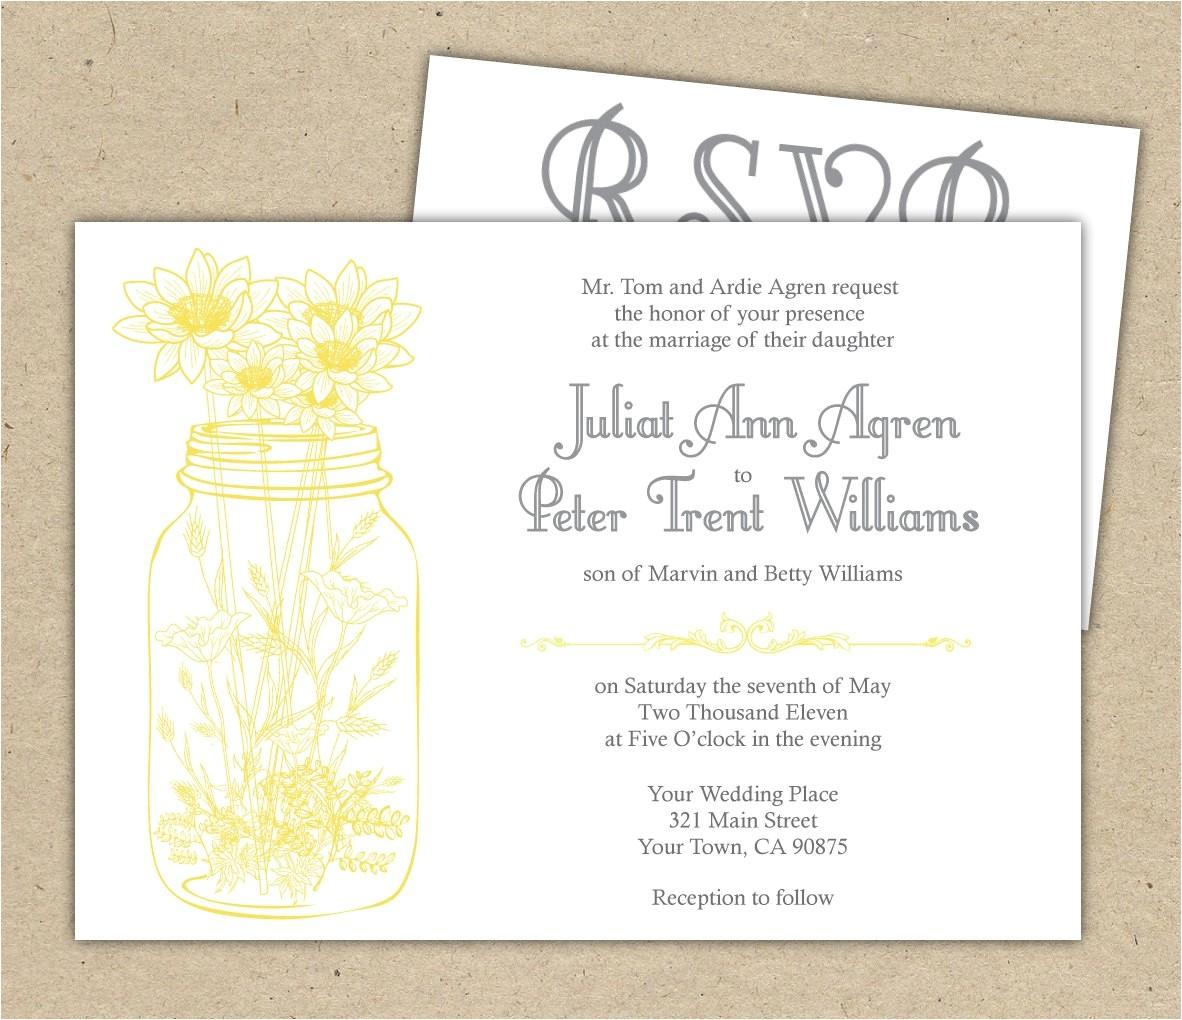 rsvp wedding invitation wording wedding rsvp follow up email wording bernit bridal